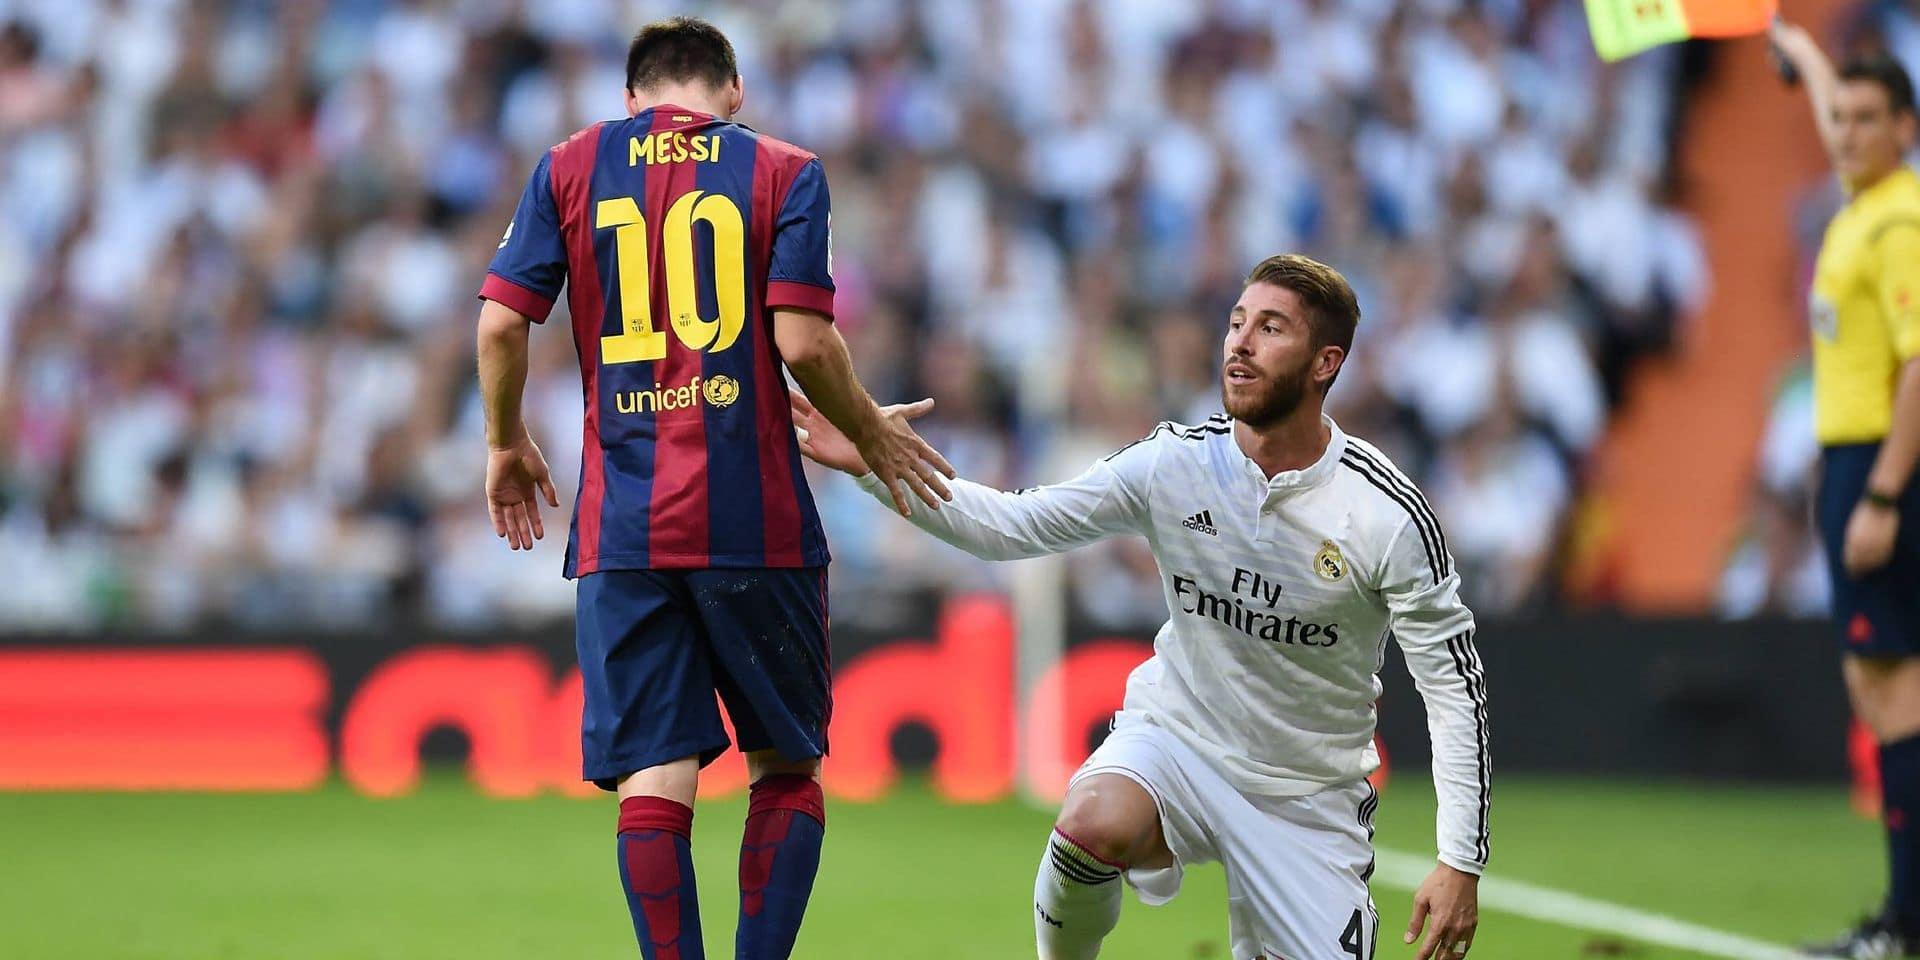 FUSSBALL INTERNATIONAL PRIMERA DIVISION SAISON 2014 2015 9 Spieltag El Clasico Real Madrid FC Bar